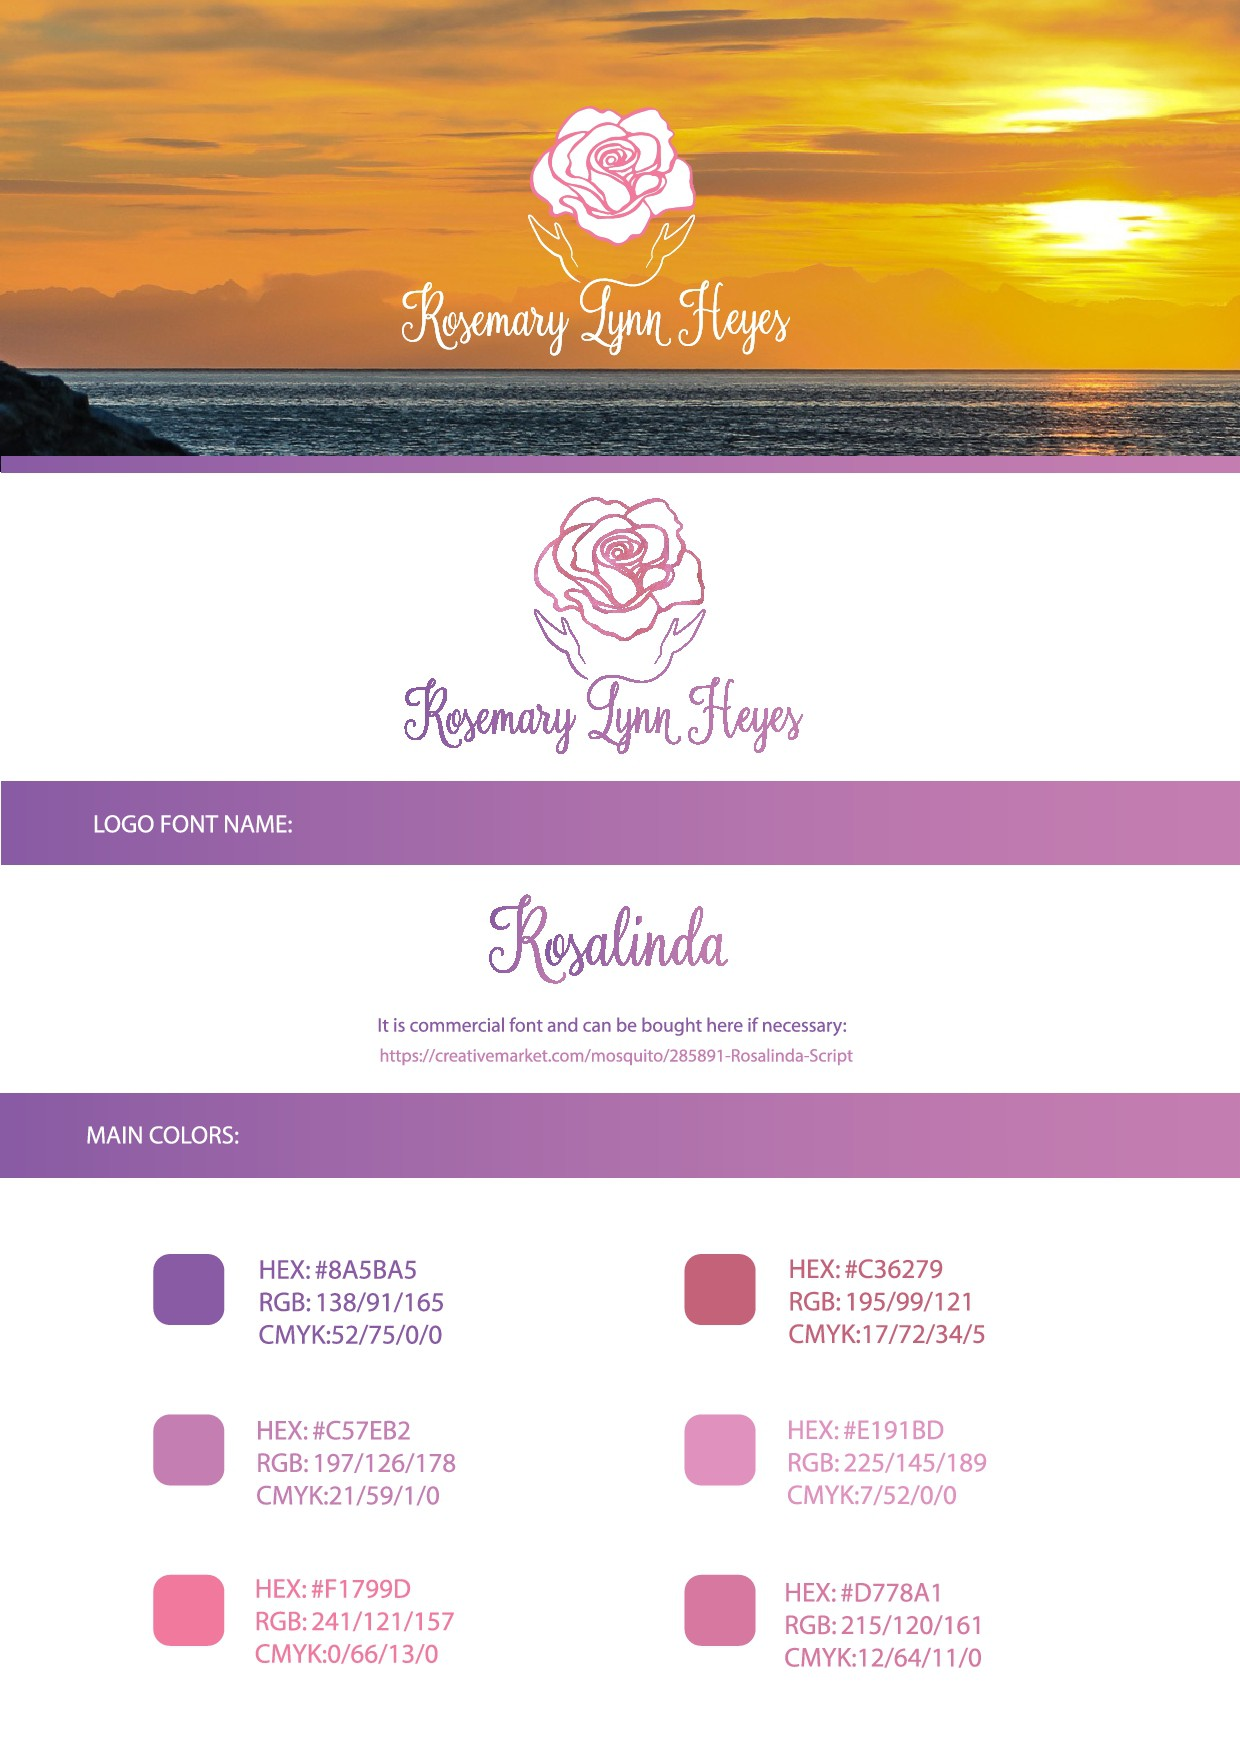 New Website Design For Eiman